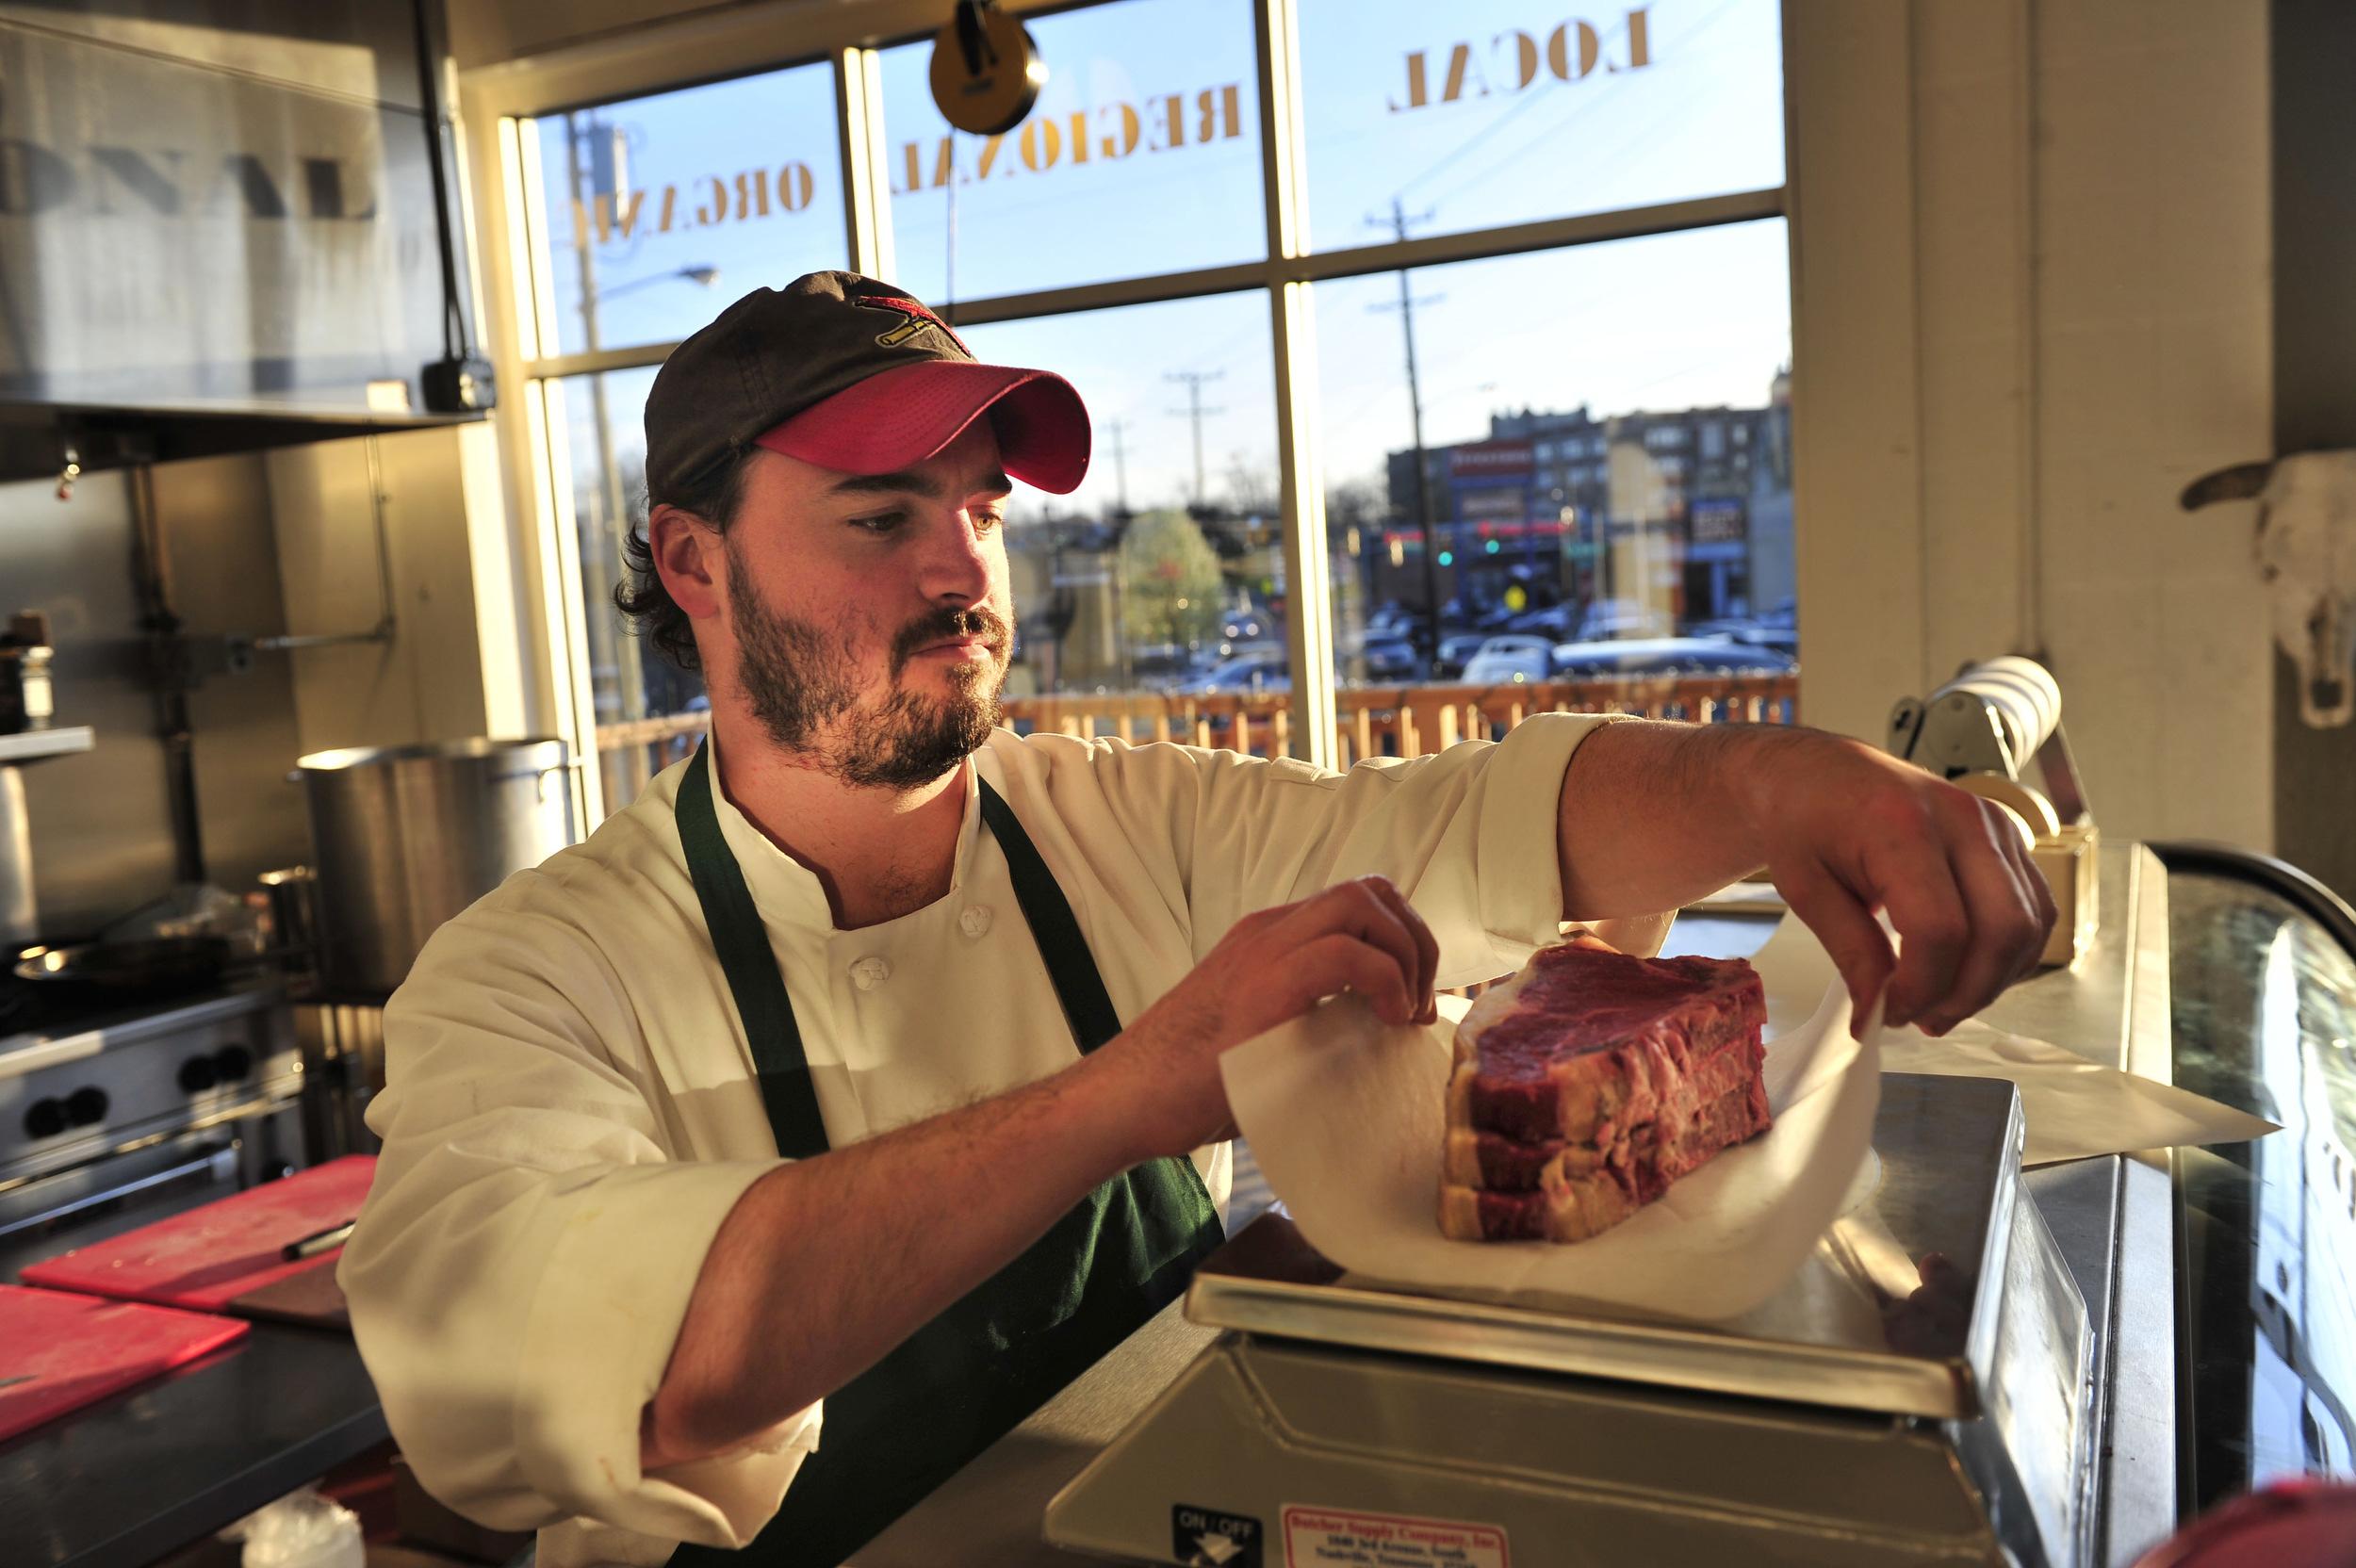 Co-founder James Peisker weighs freshly cut steaks at Porter Road Butcher in Nashville, Tenn.